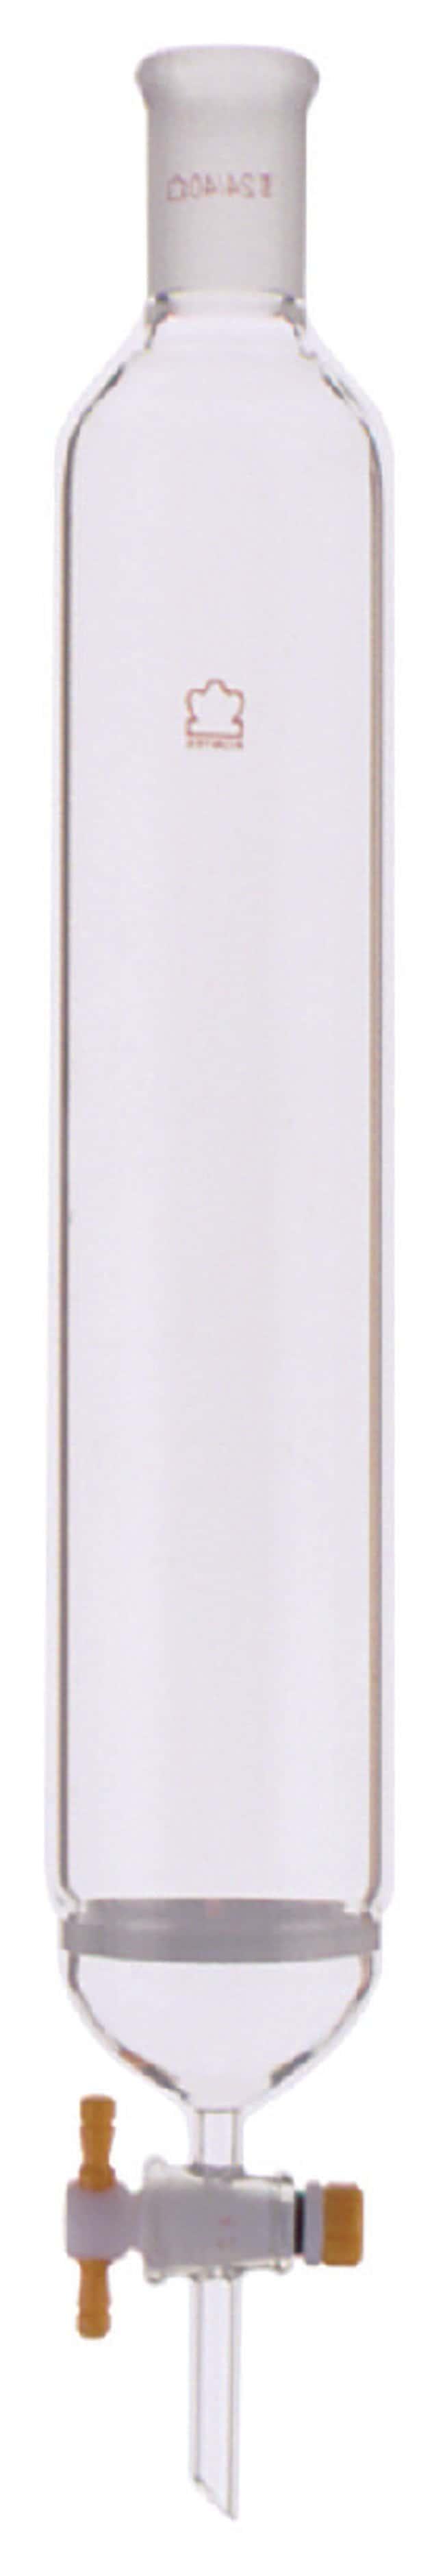 DWK Life SciencesKimble™ Kontes™ Column with Standard Taper Joint